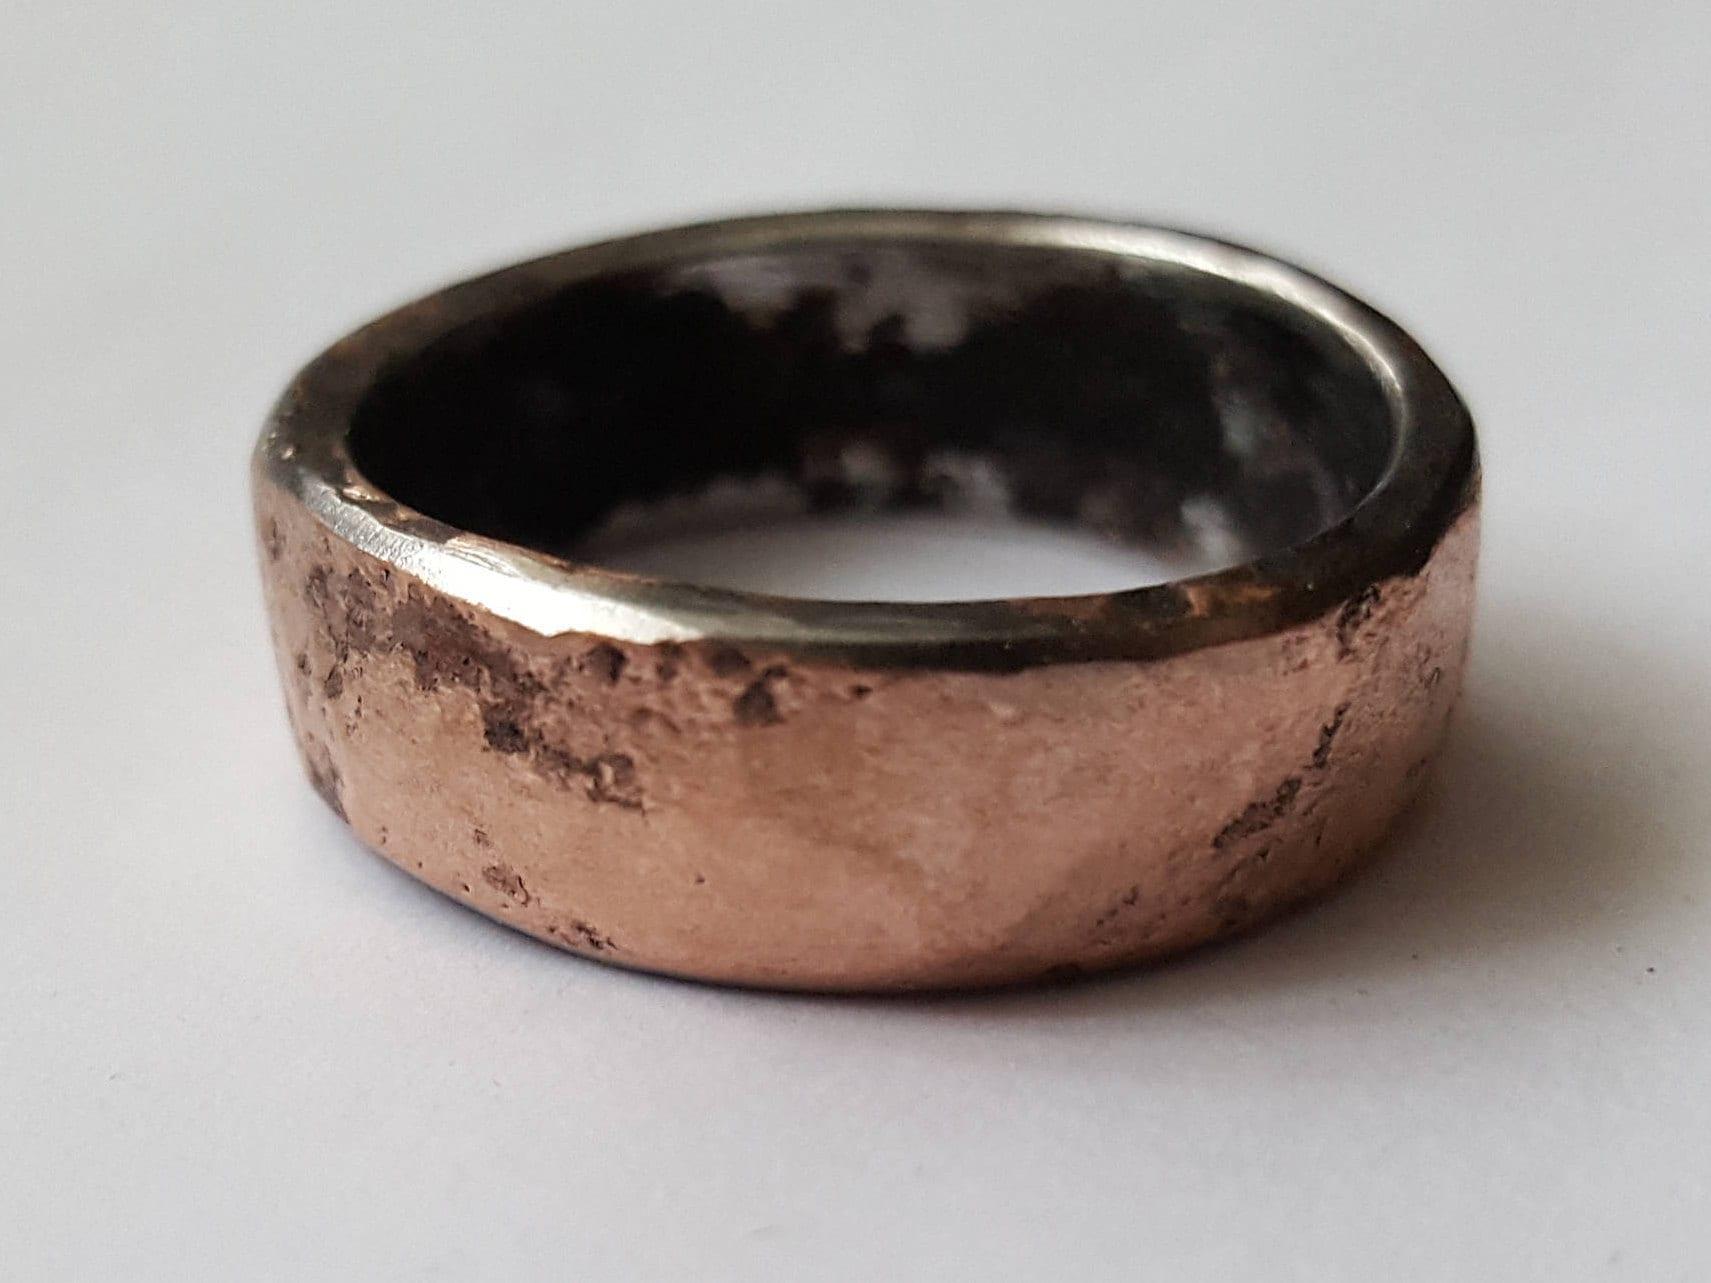 50: Wedding Ring Forged Iron At Reisefeber.org